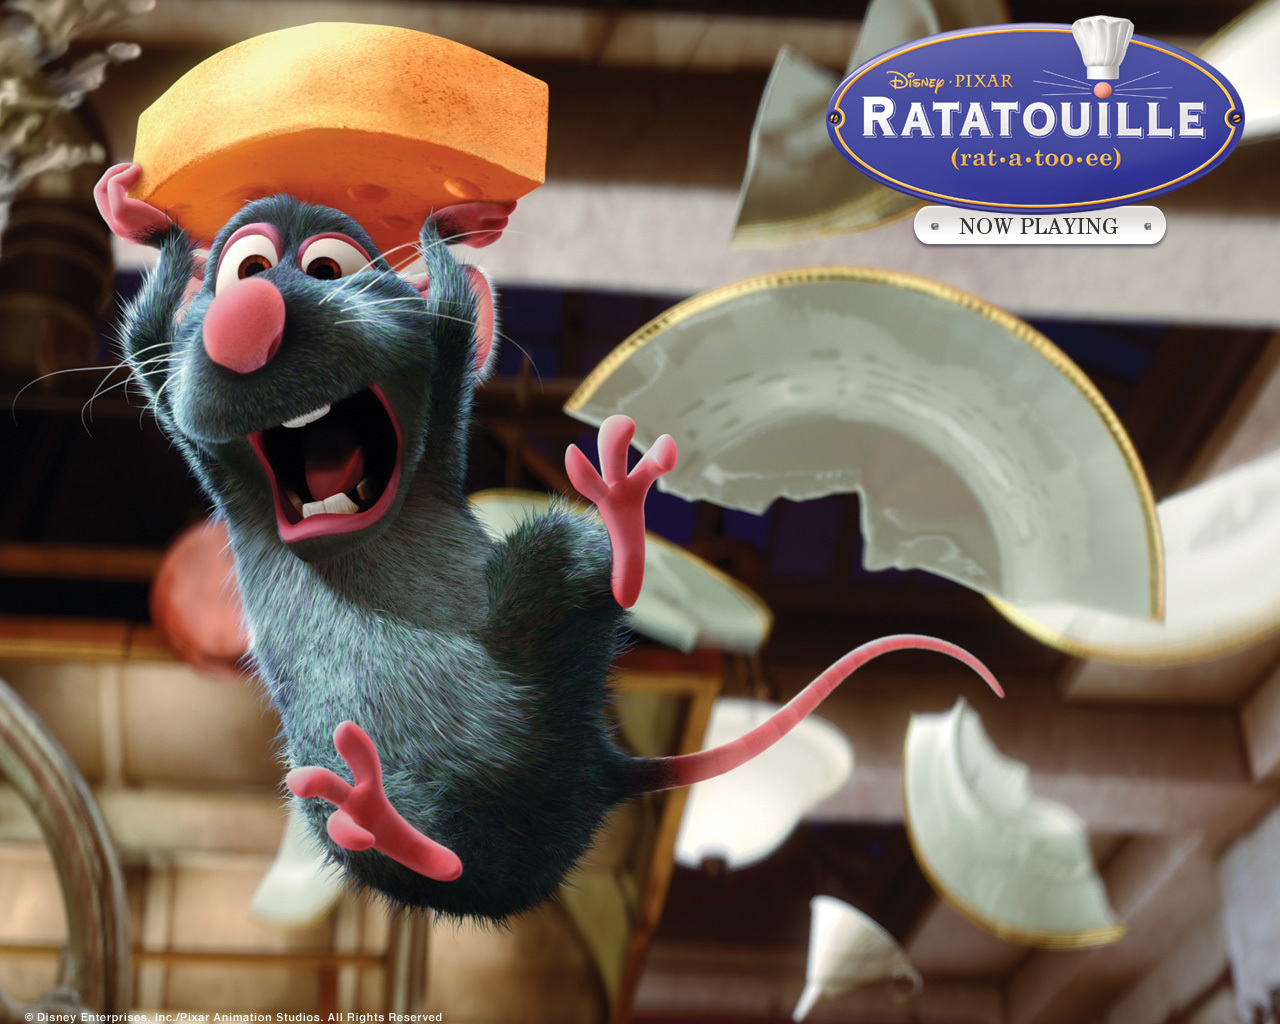 http://4.bp.blogspot.com/_2n9G8hS3AbI/TUt_pH6Nc2I/AAAAAAAACF4/_dGu0kzZBa4/s1600/Ratatouille+New+Pictures.jpg